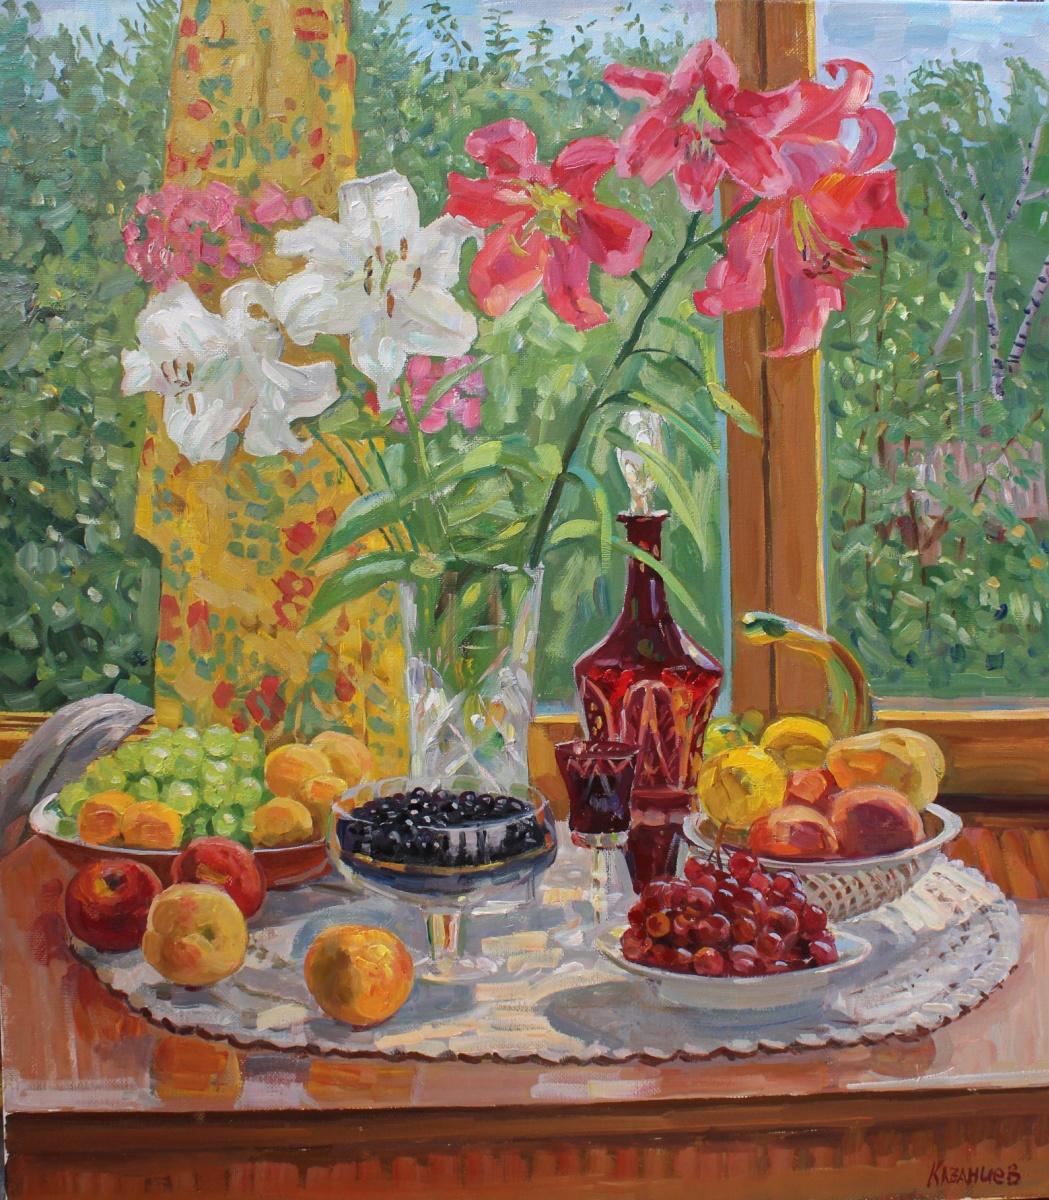 Eugene Alexandrovich Kazantsev. Натюрморт Лилии,виноград,черная смородина.